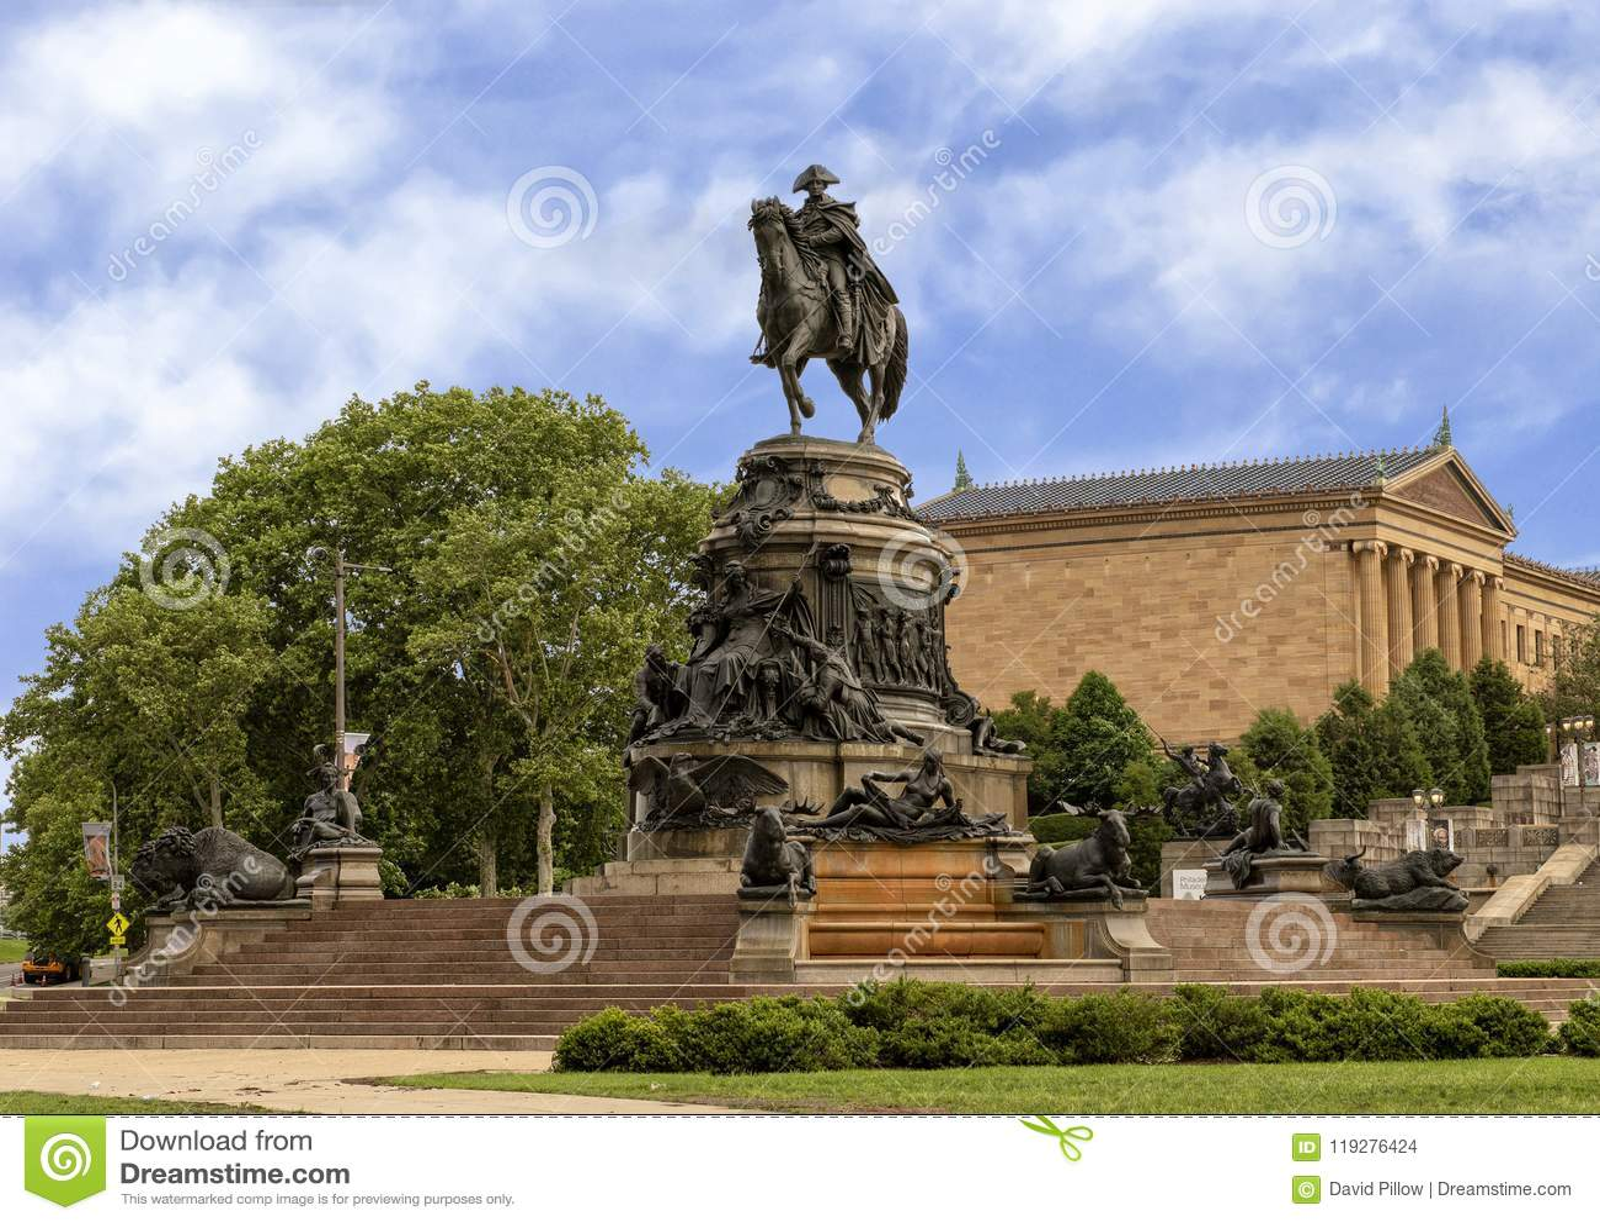 Washington Monument de Rudolf Siemering, Benjamin Franklin Parkway en el óvalo de Eakins, Philadelphia, Pennsylvania